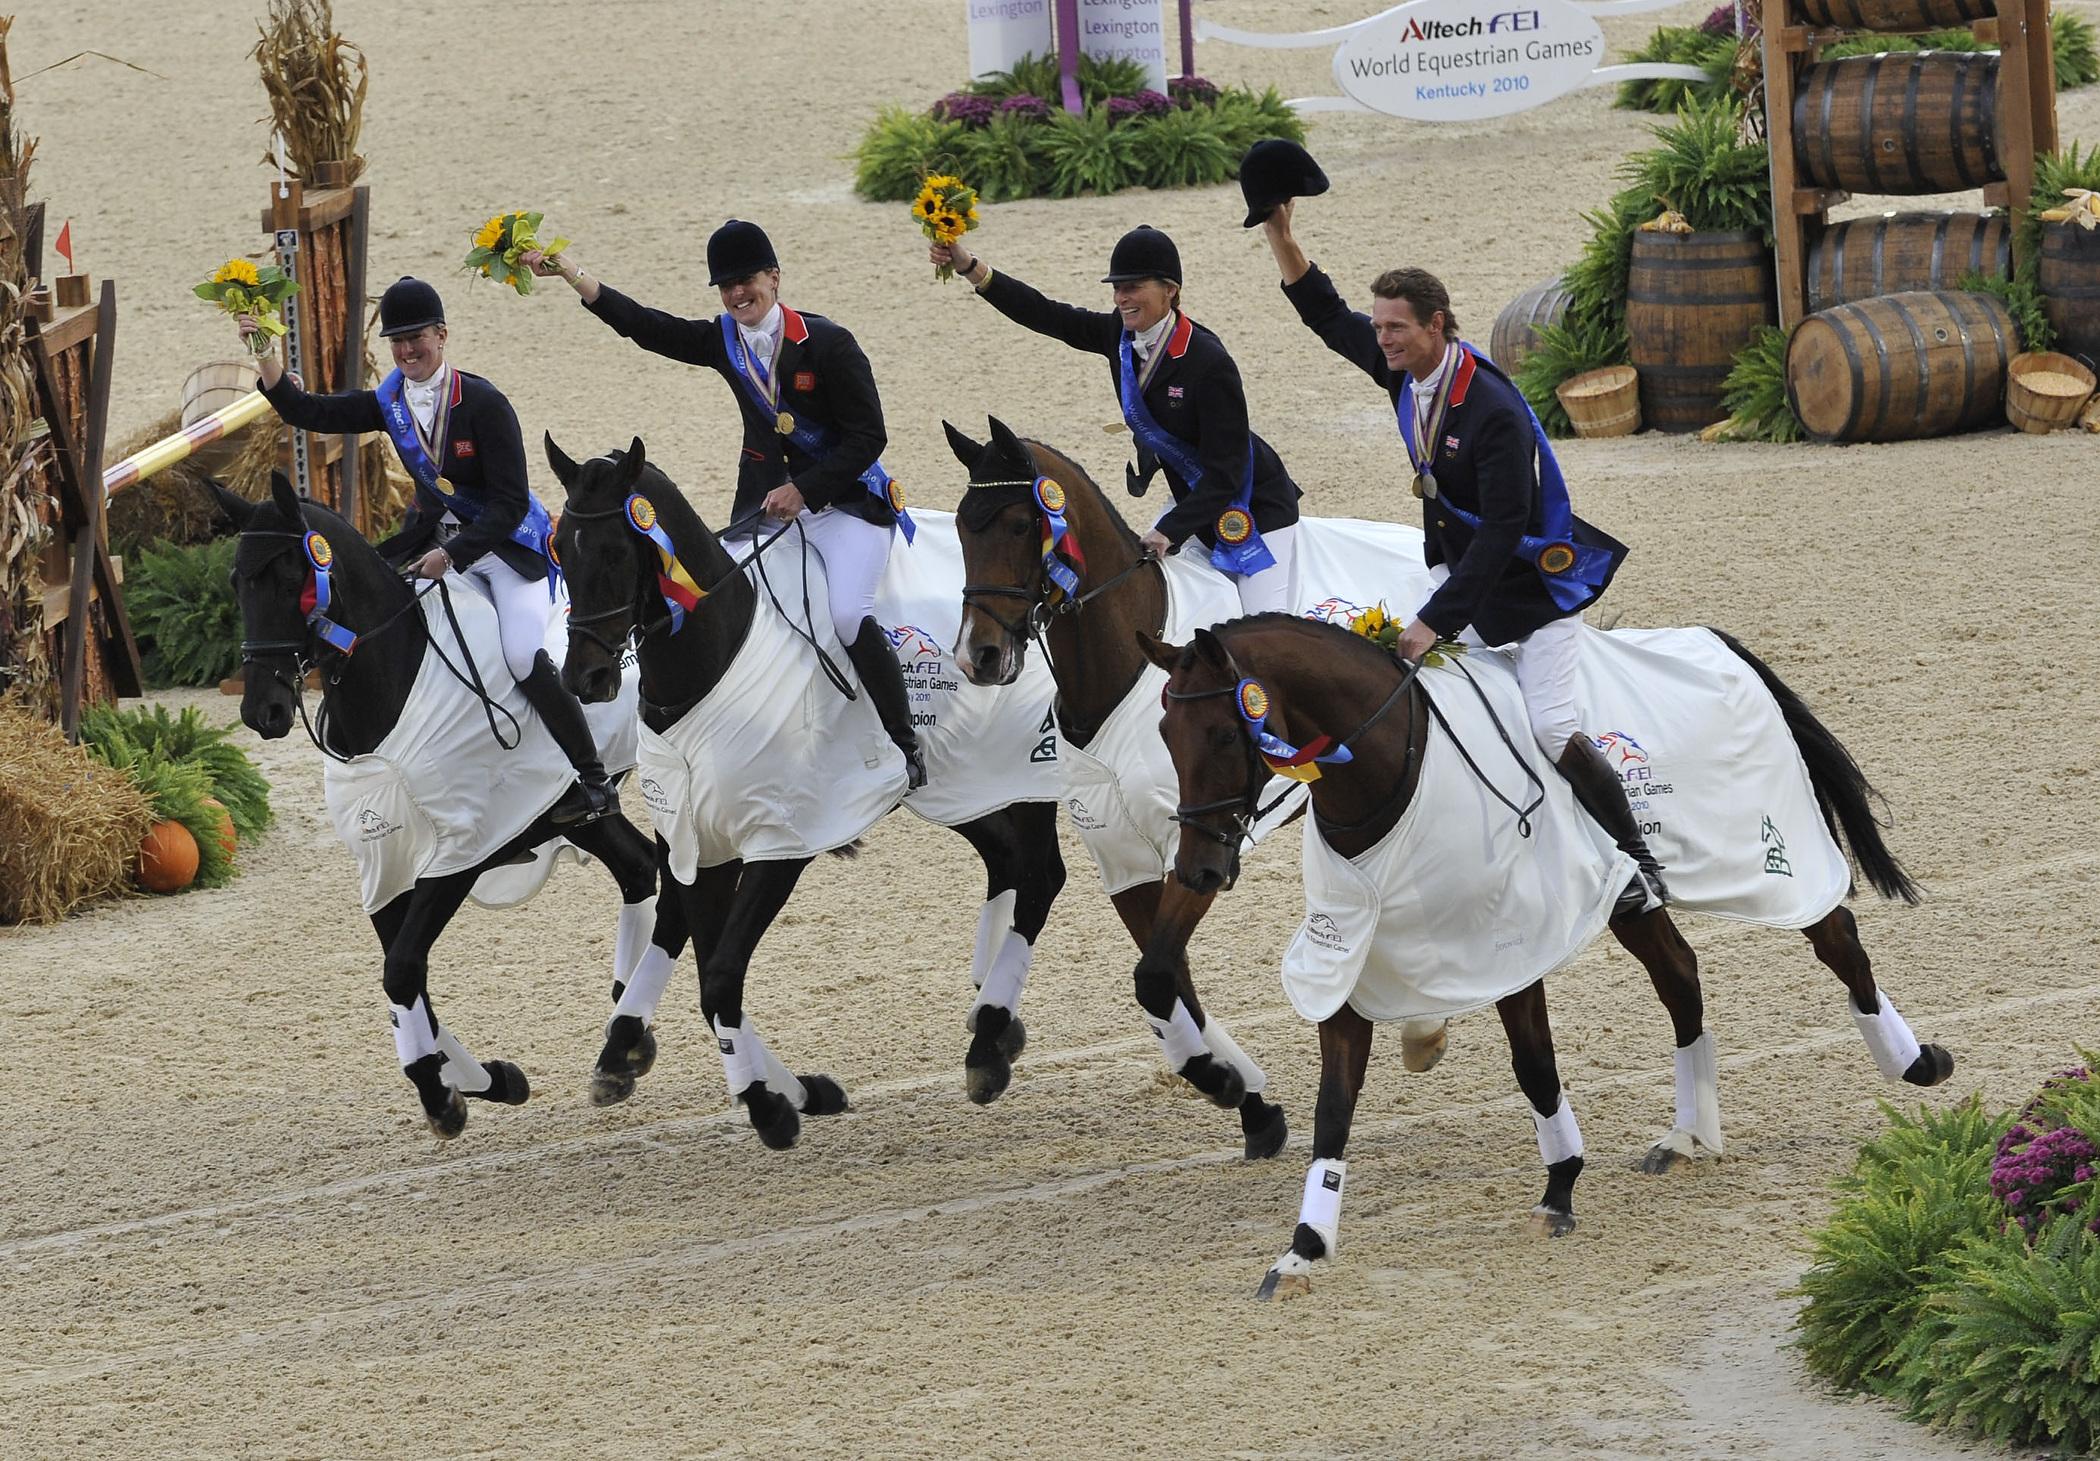 British gold medal eventing team